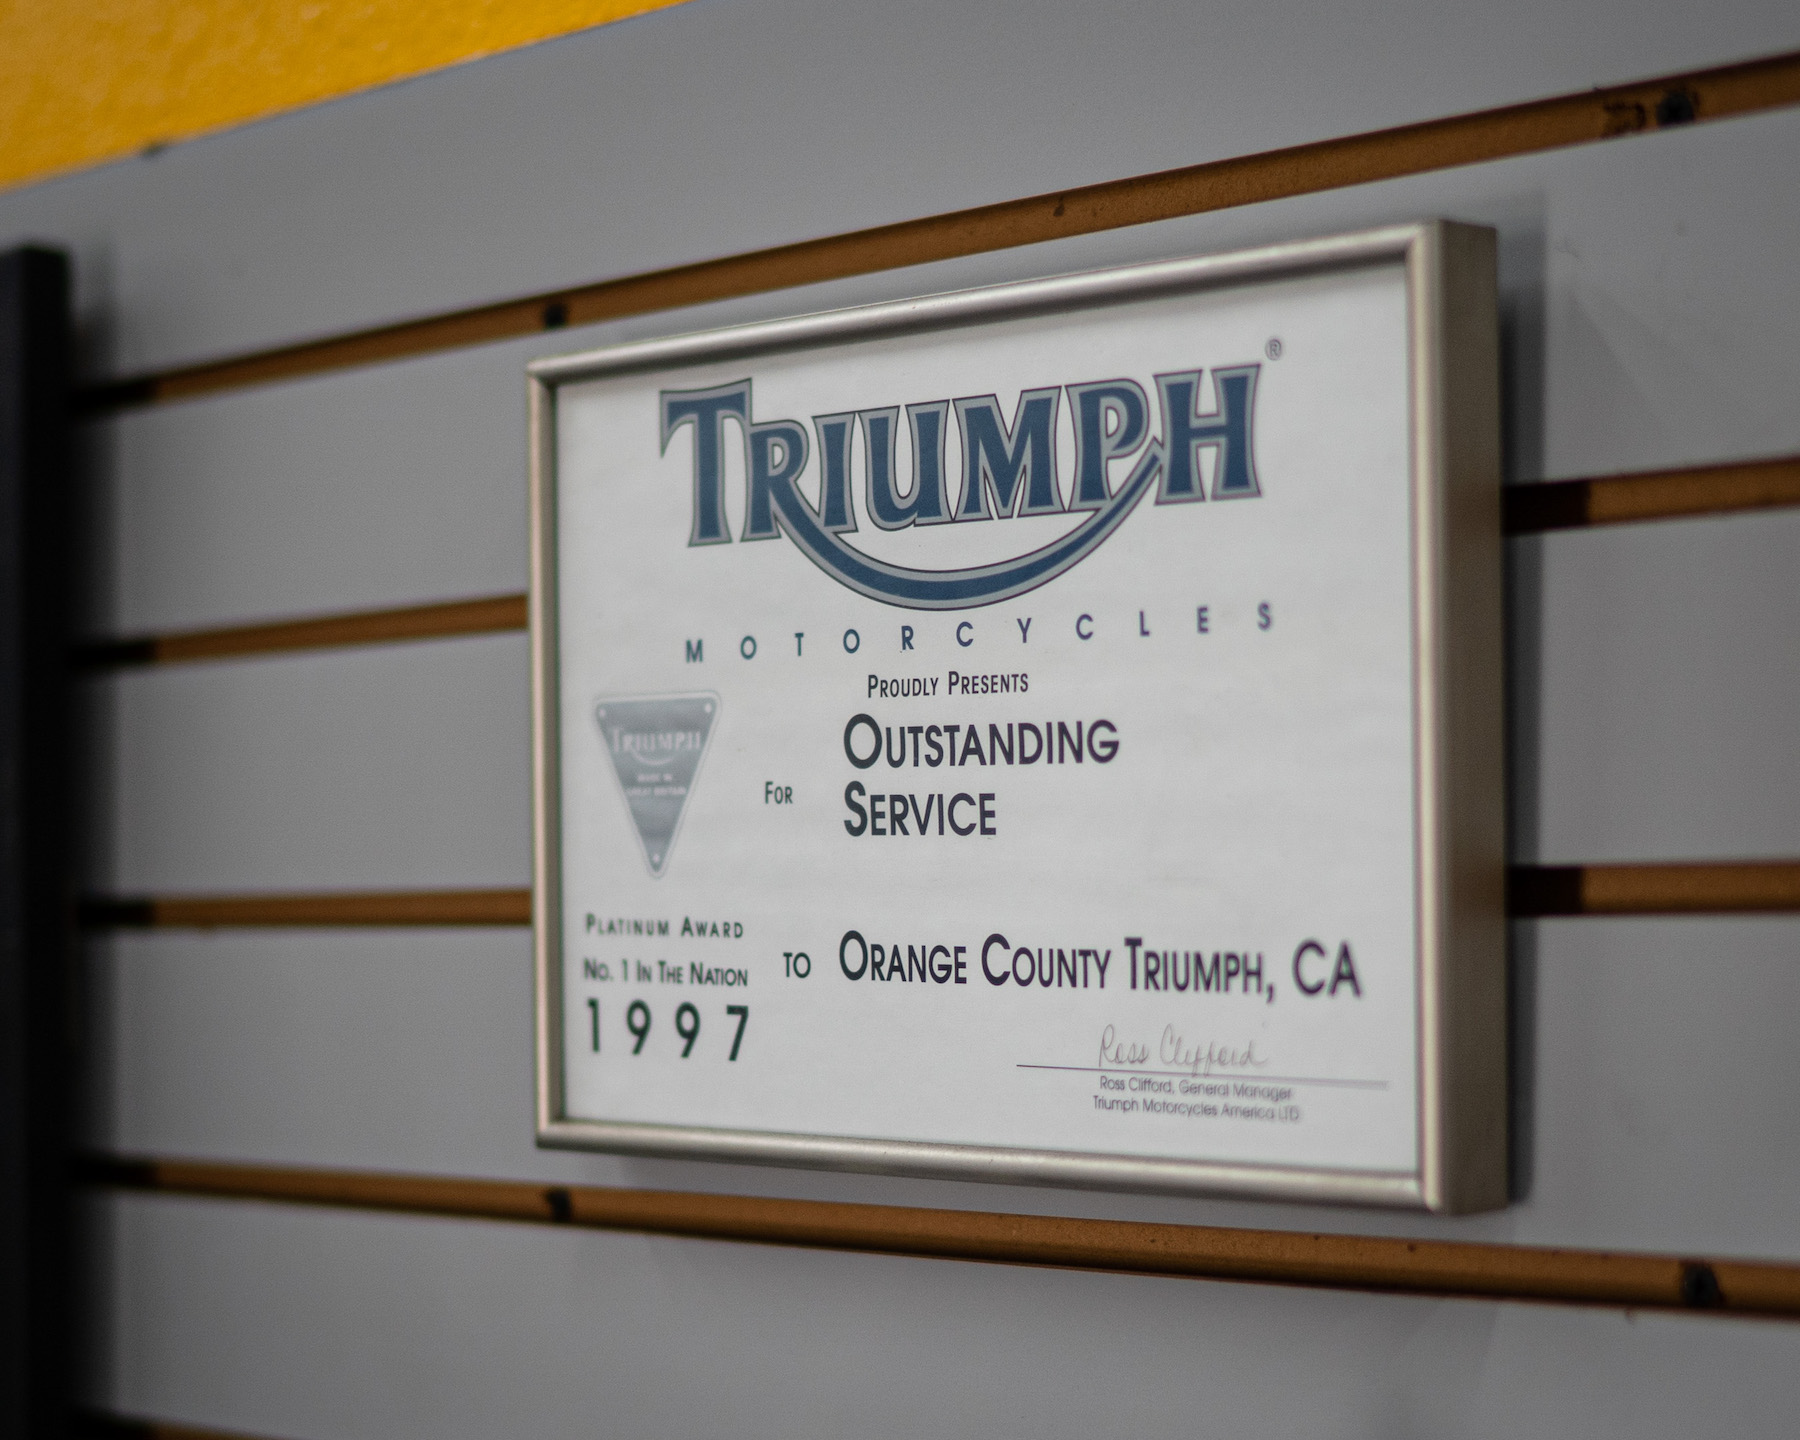 triumph-motorcycle-repair-tuner